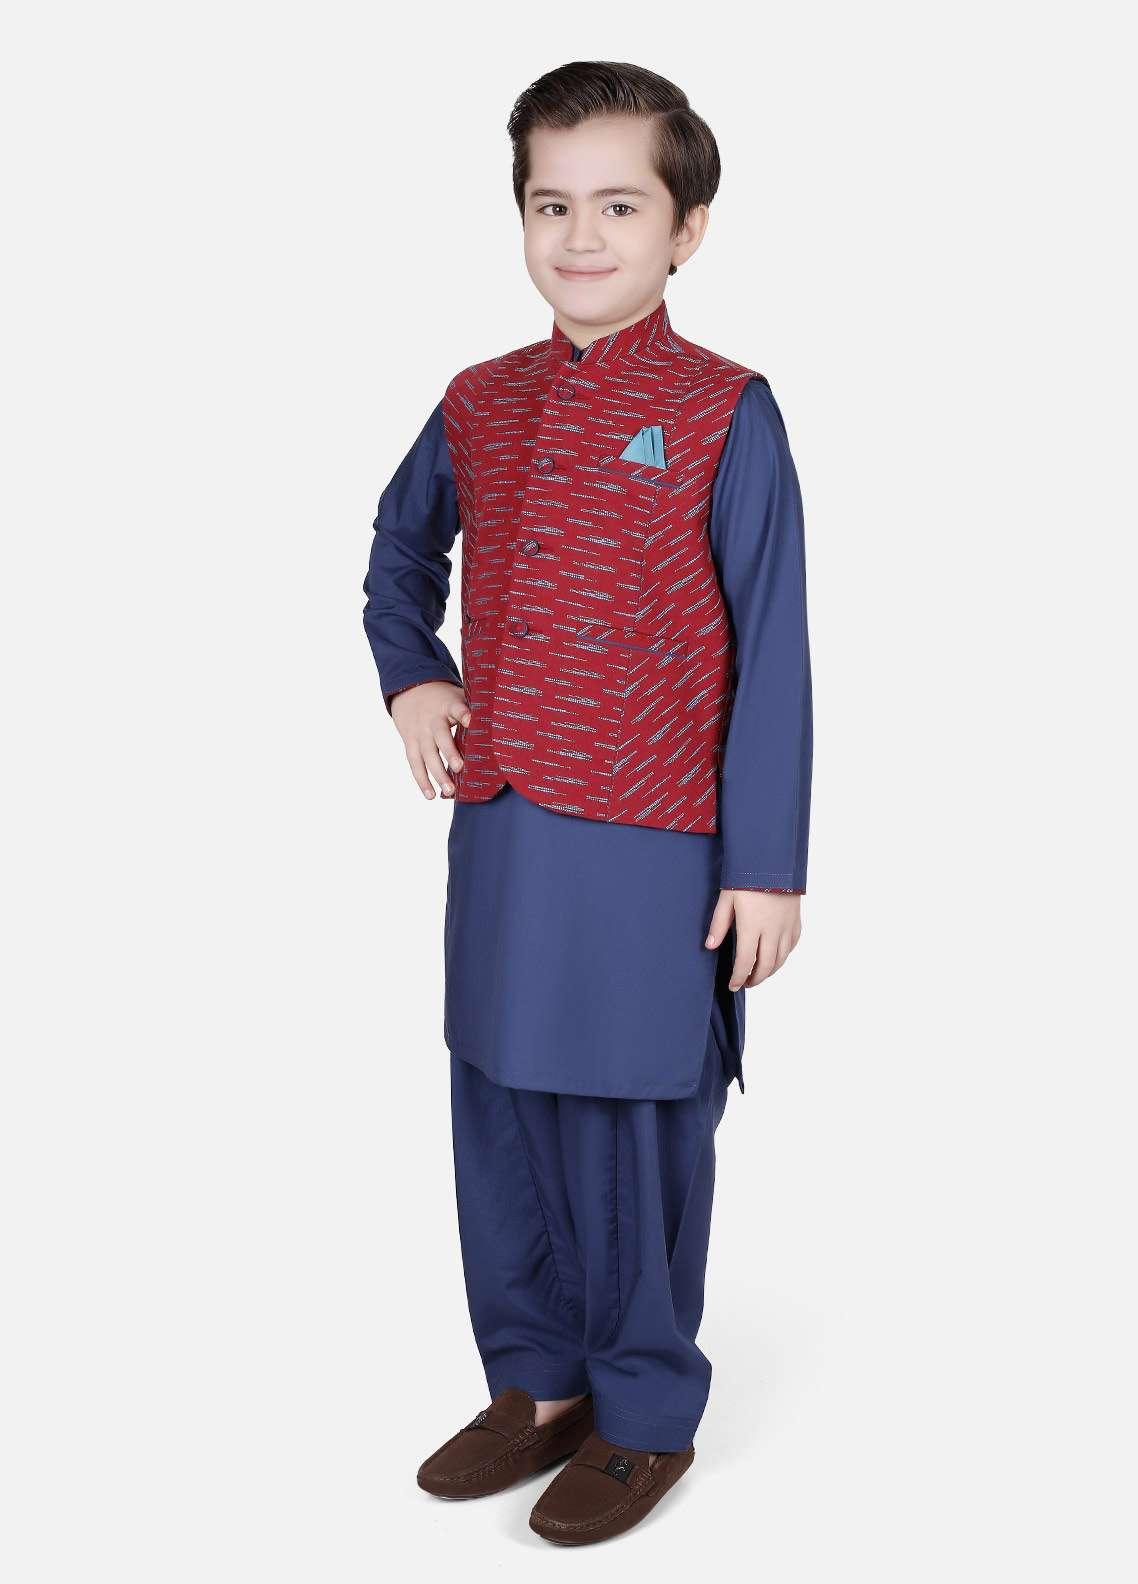 Edenrobe Cotton Fancy Boys Waistcoat Suits - Navy Blue EDW18B 25077